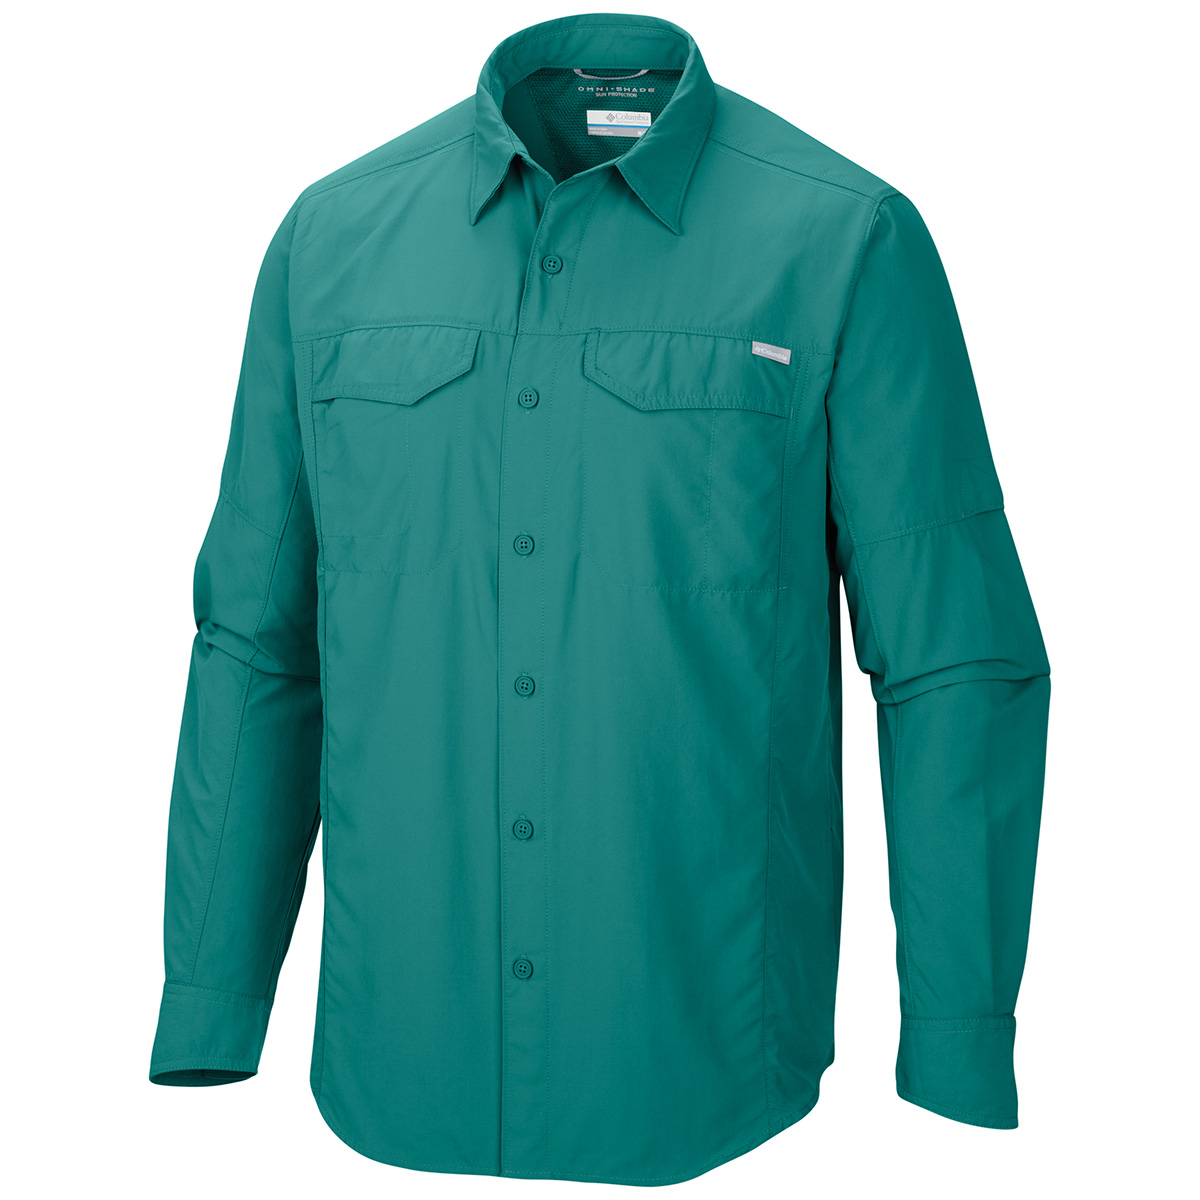 Columbia silver ridg long sleeve shirt fishing shirts for Two fish apparel